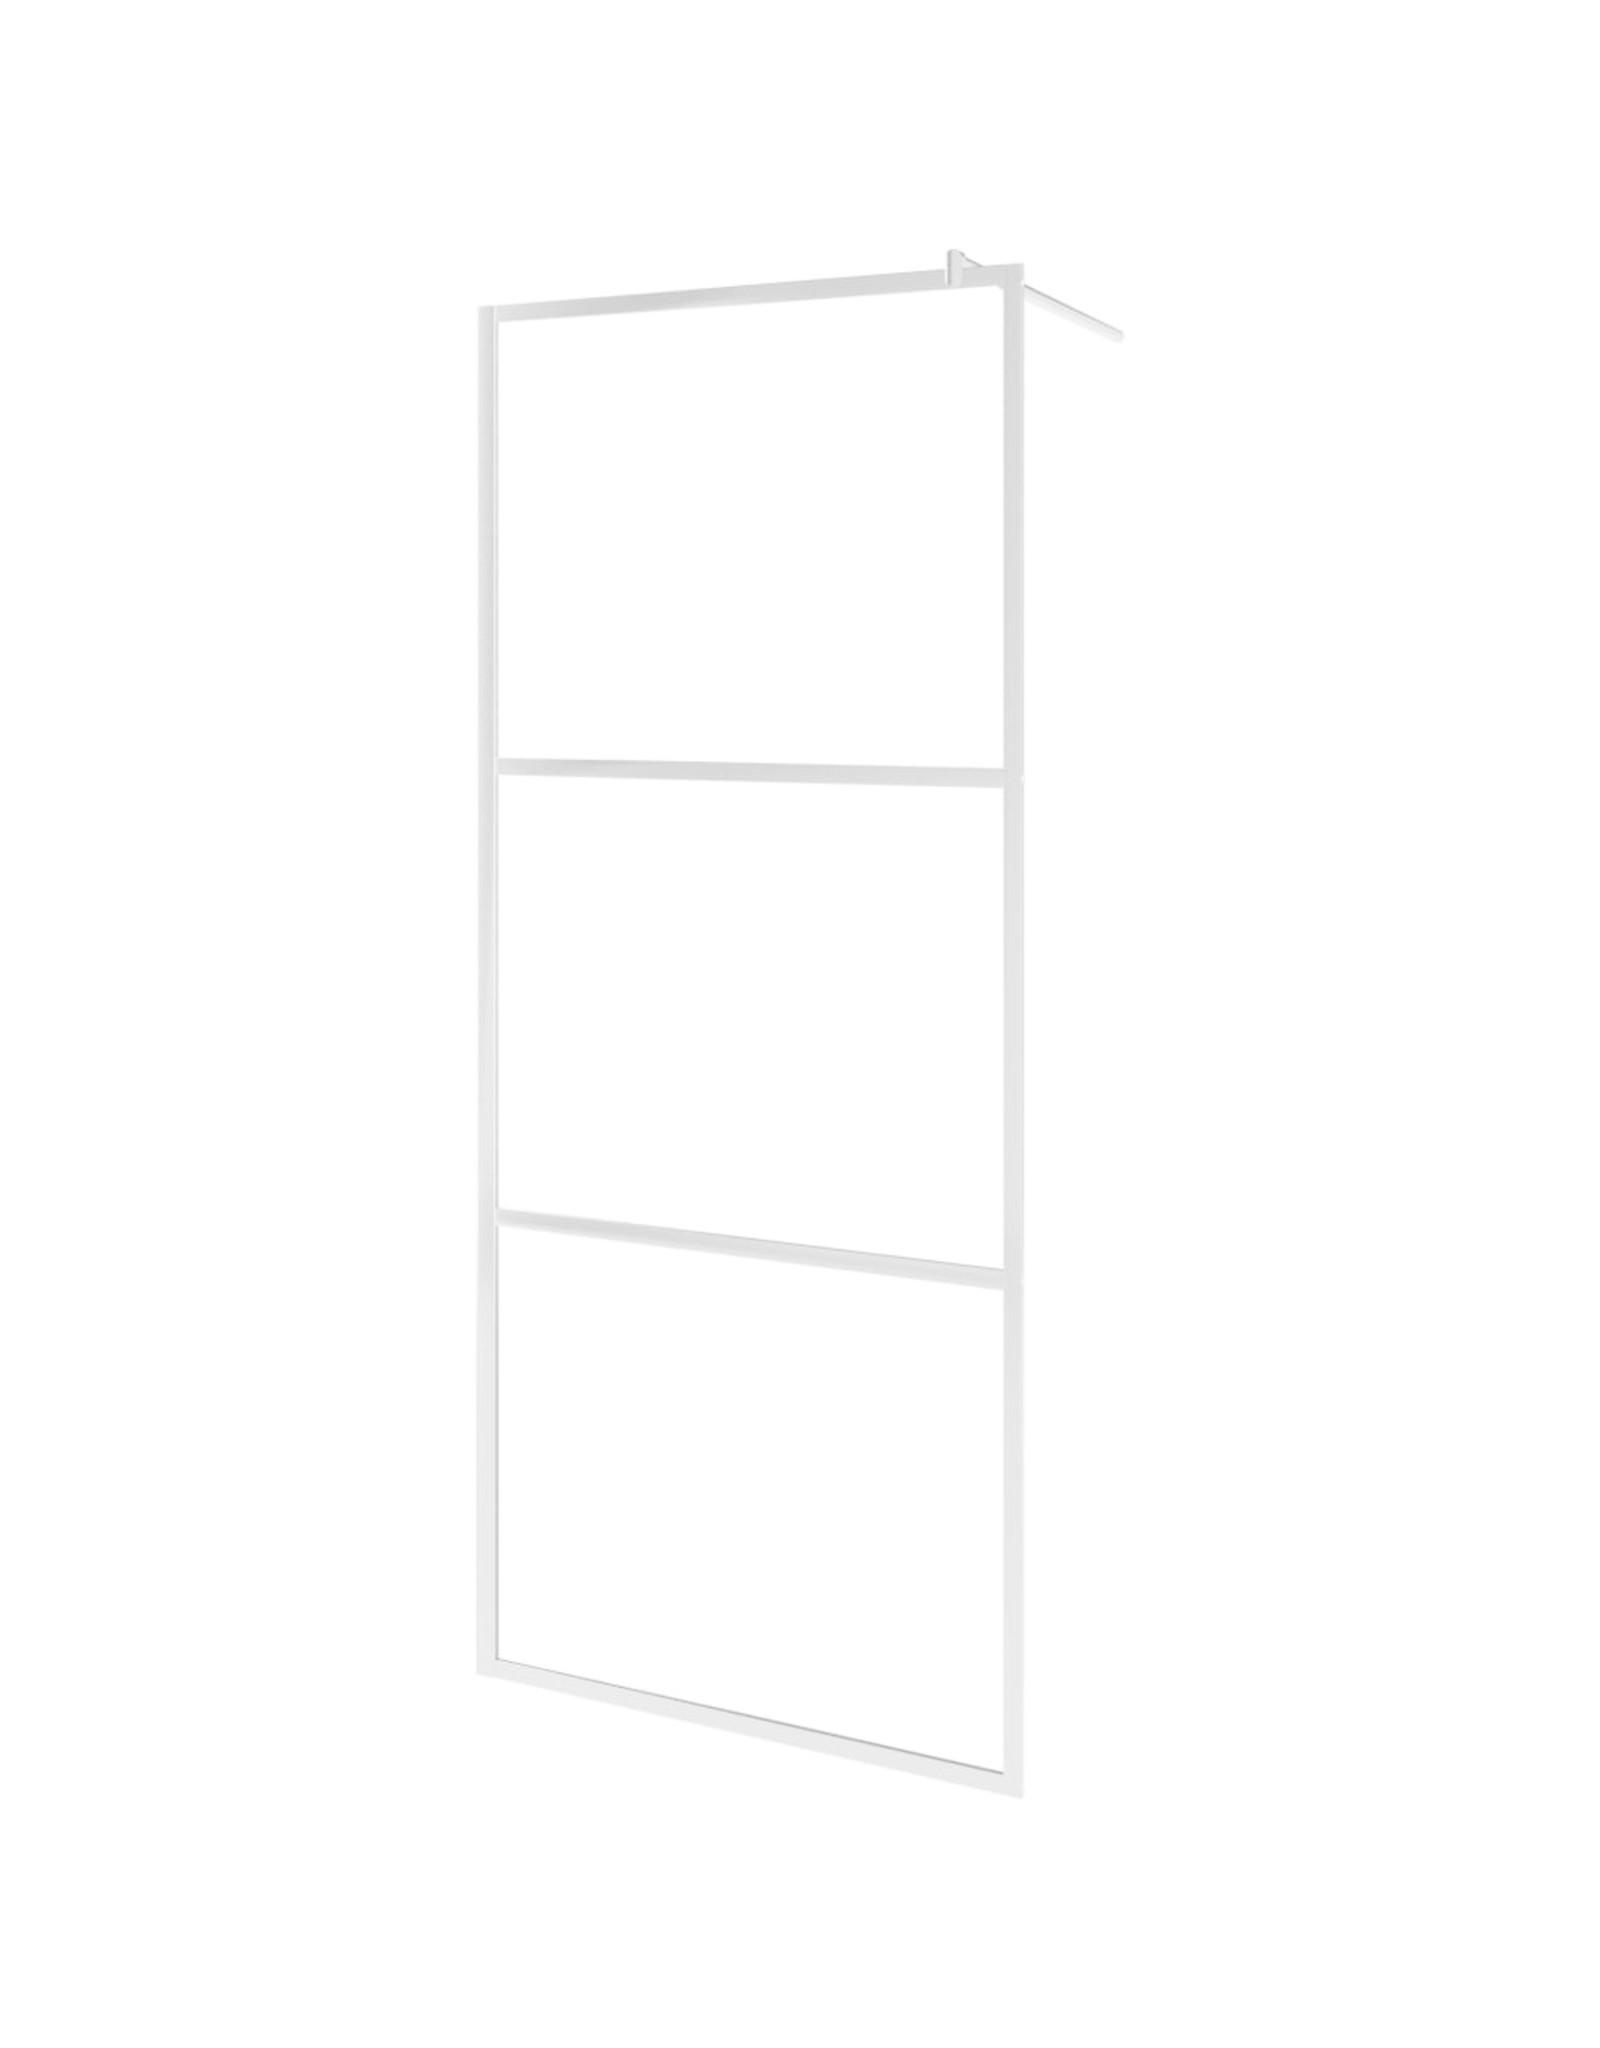 Inloopdouchewand mat 115x195 cm ESG-glas